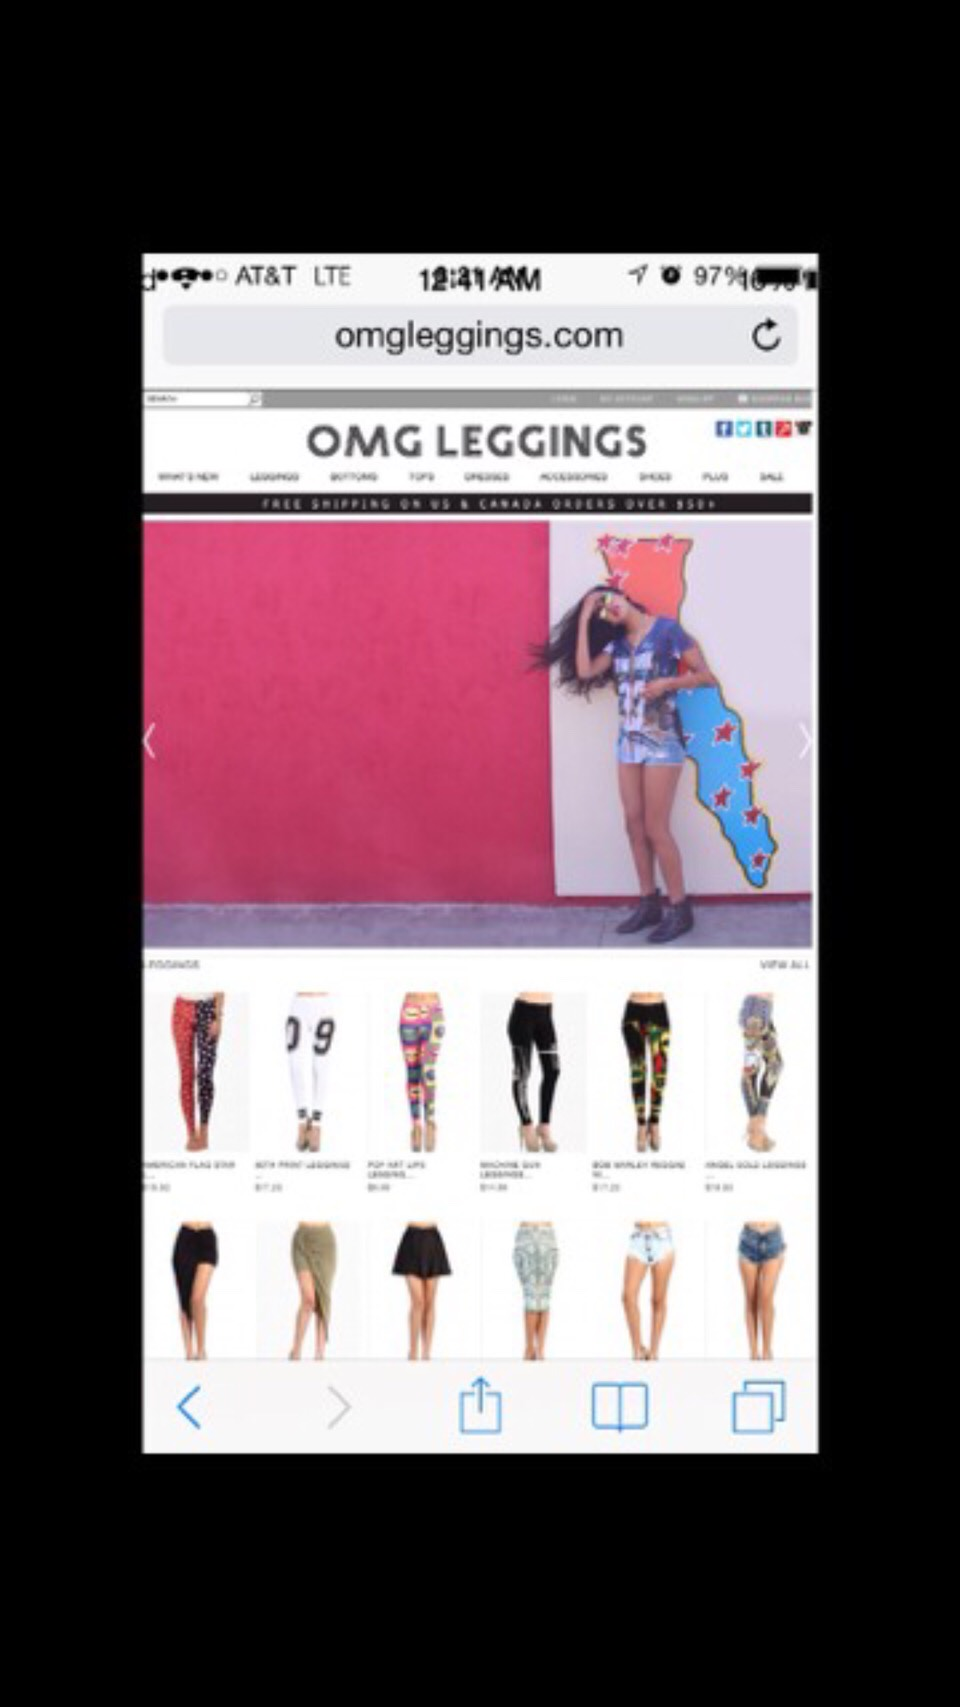 Omgleggins.com